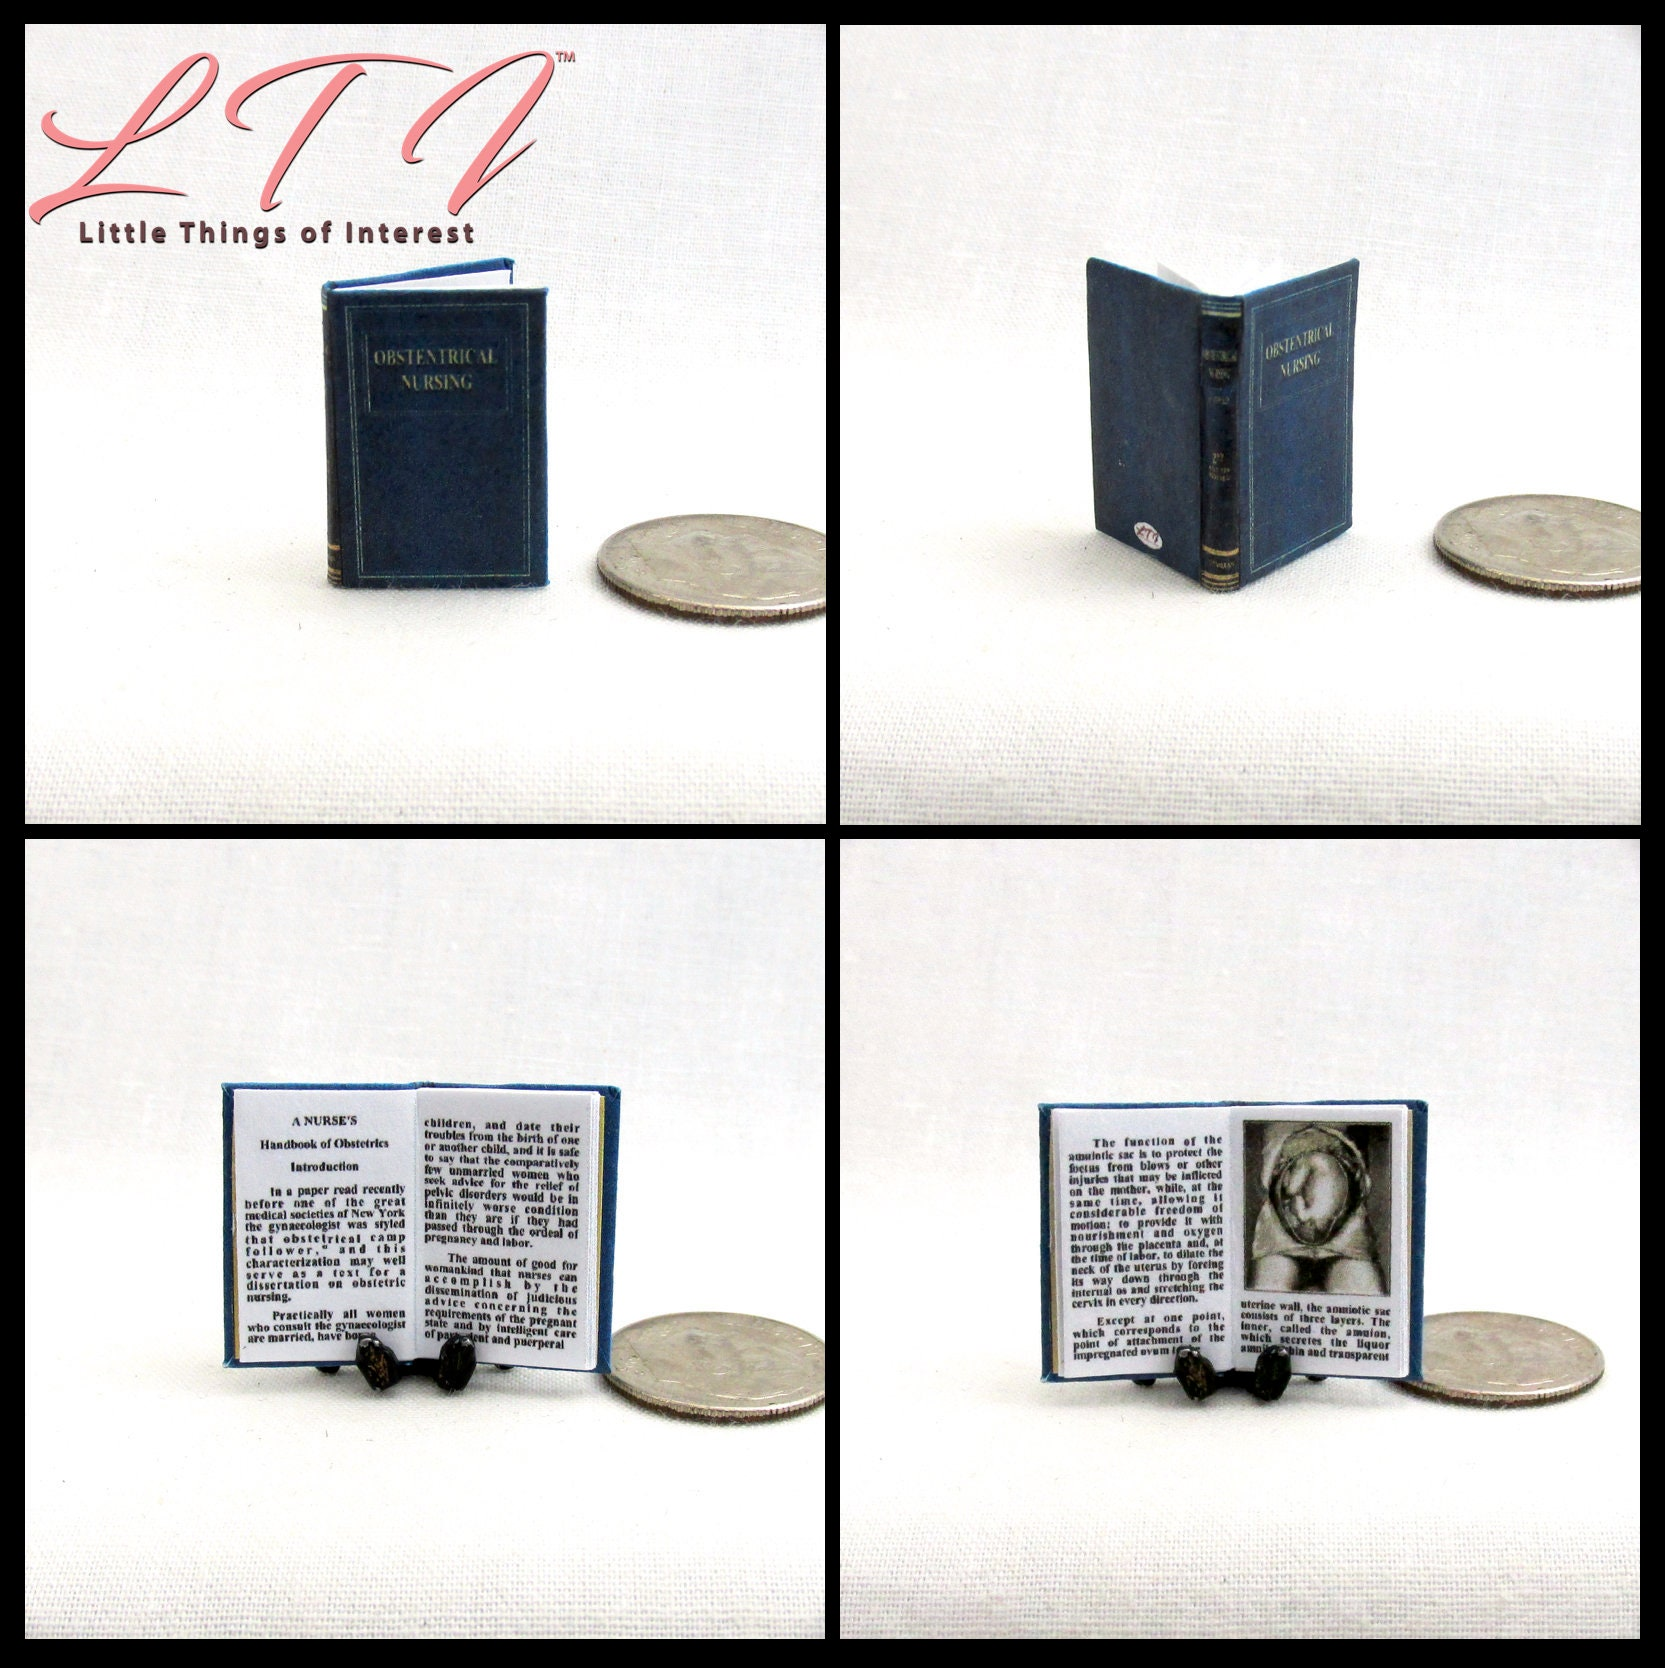 OBSTETRICS NURSING TEXTBOOK Dollhouse Miniature Book 1:12 Scale